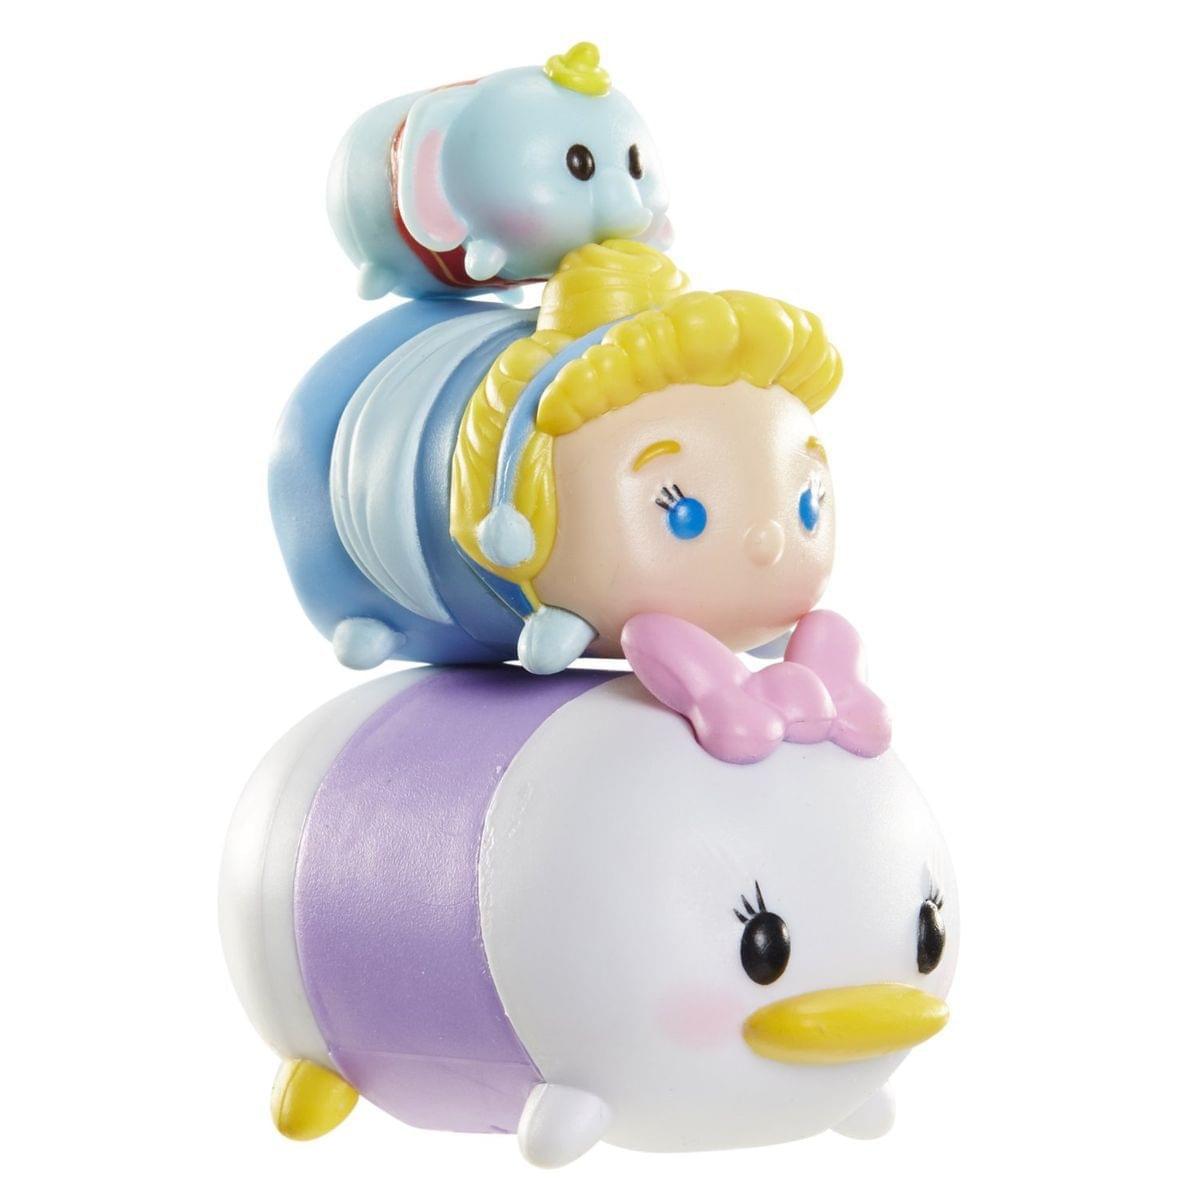 Disney Tsum Tsum 3 Pack: Dumbo, Cinderella, Daisy